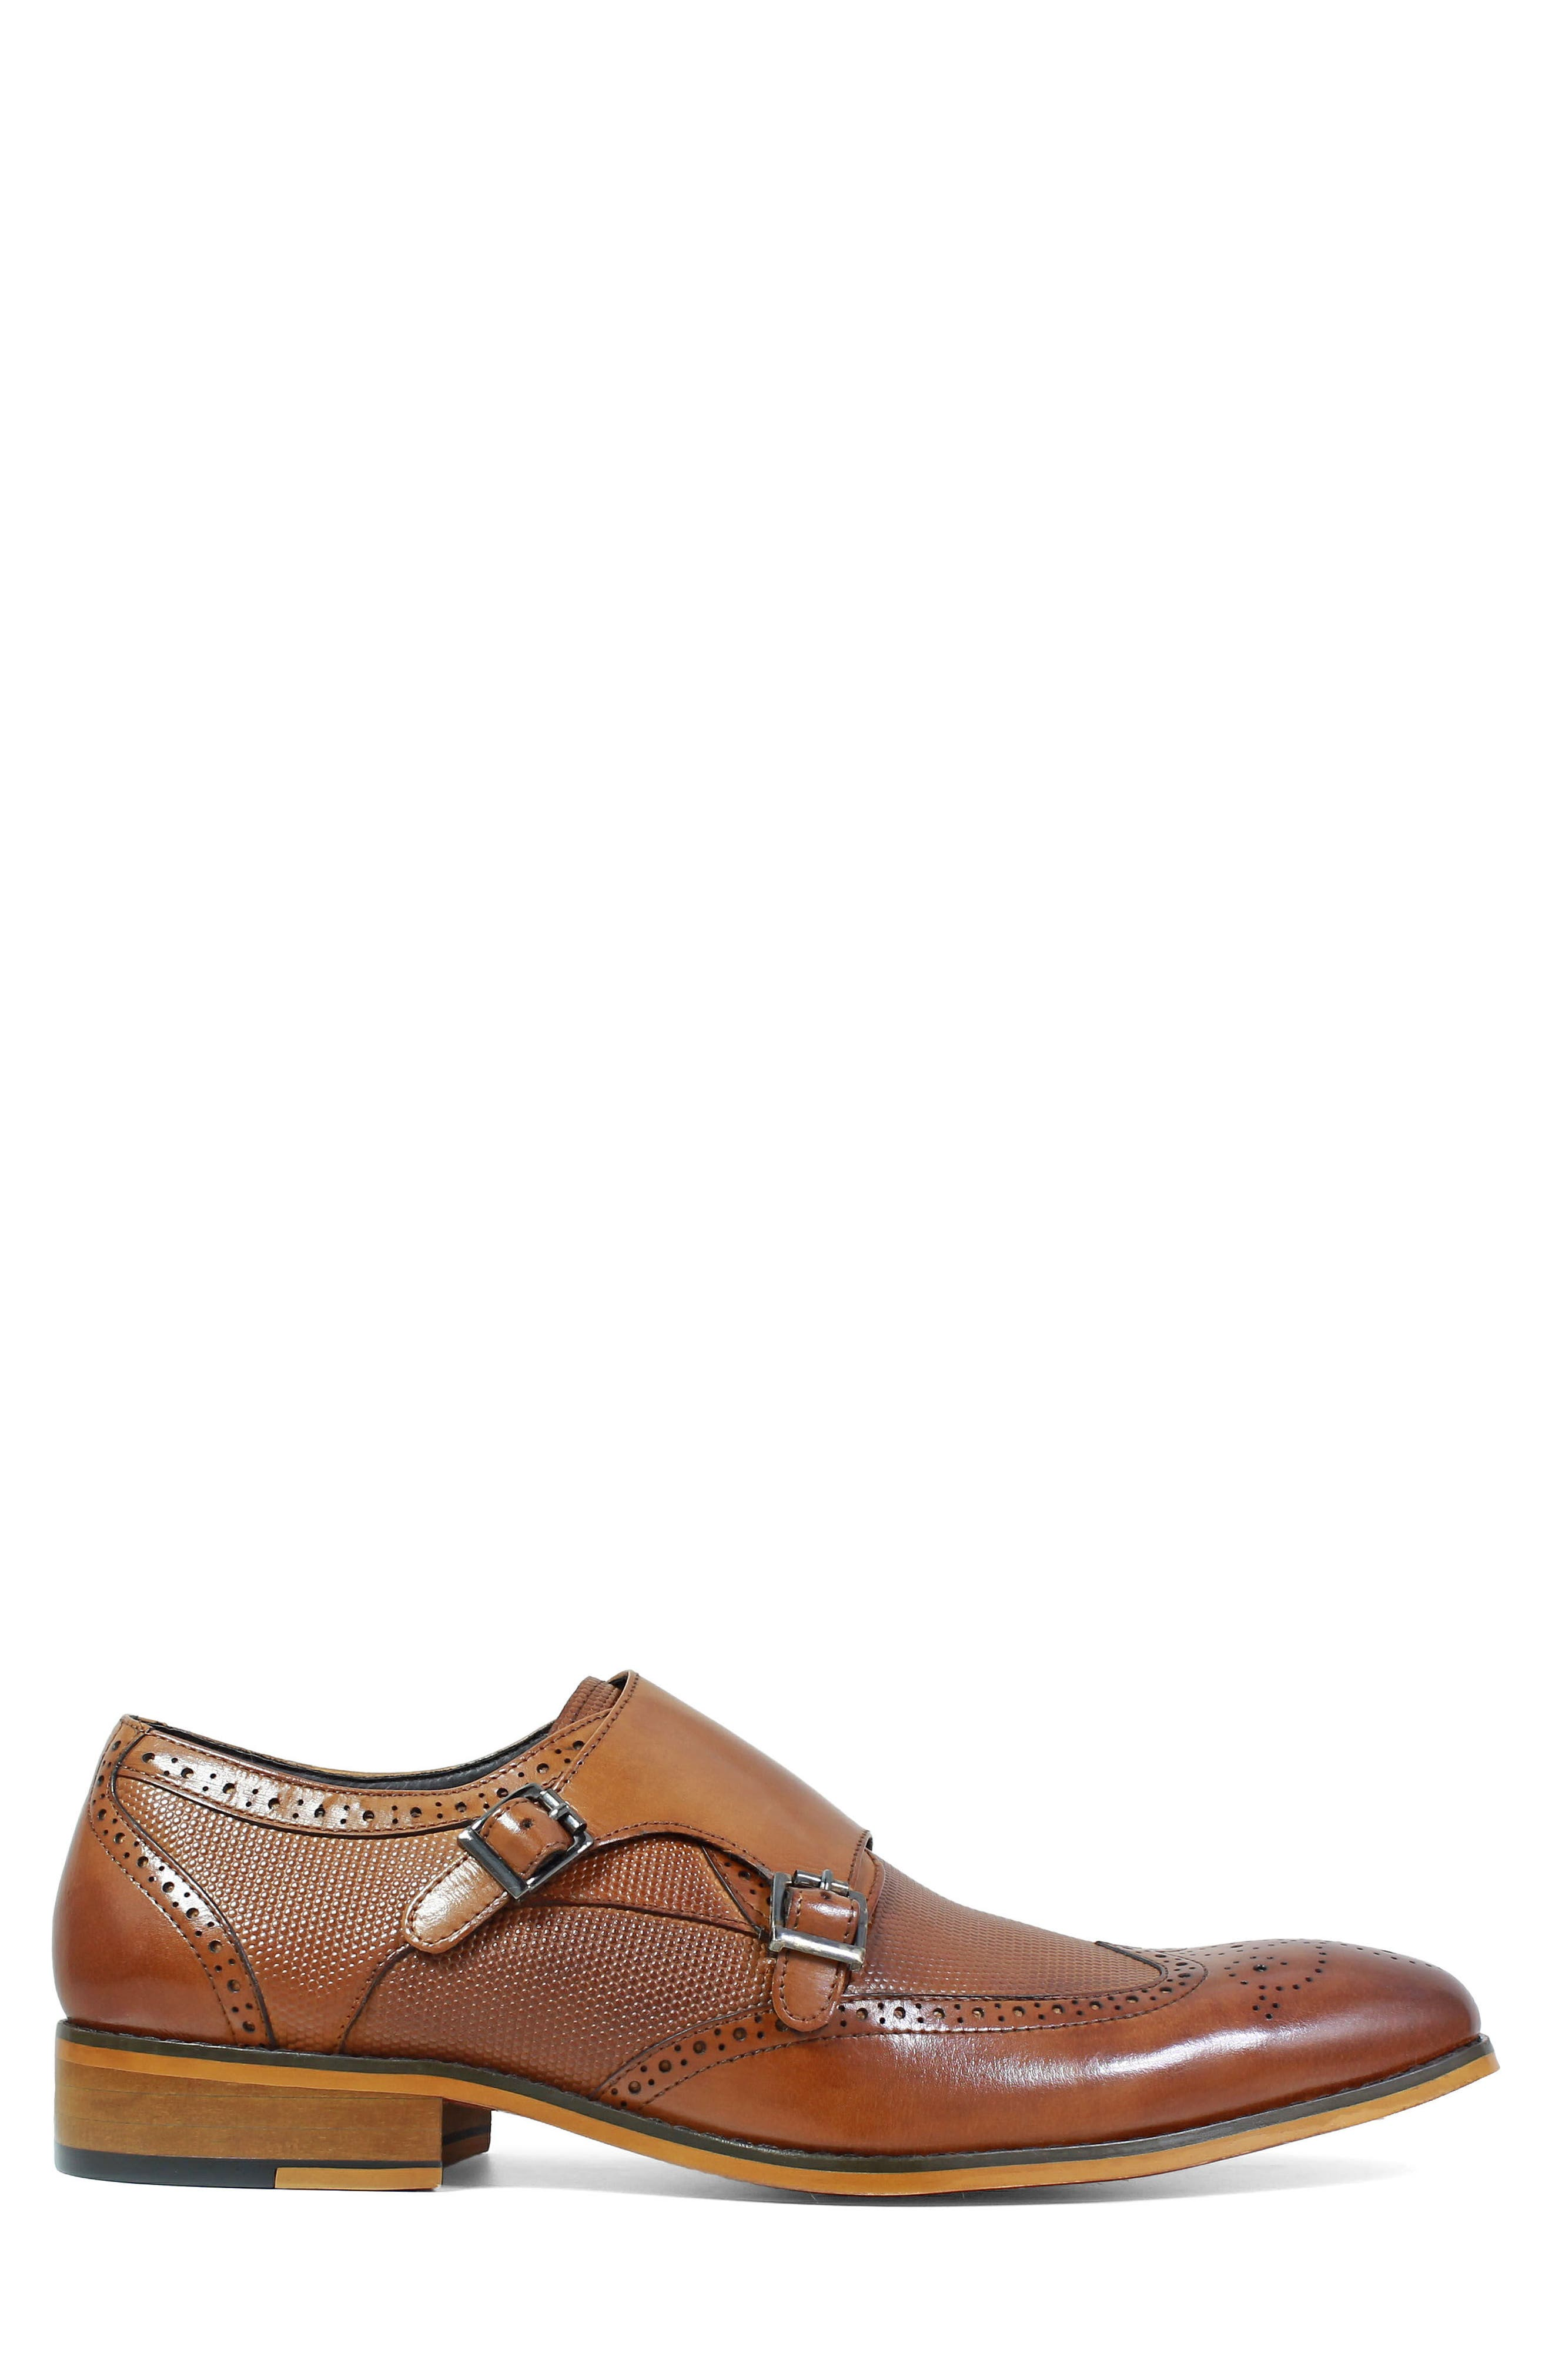 Lavine Wingtip Monk Shoe,                             Alternate thumbnail 3, color,                             Saddle Tan Leather